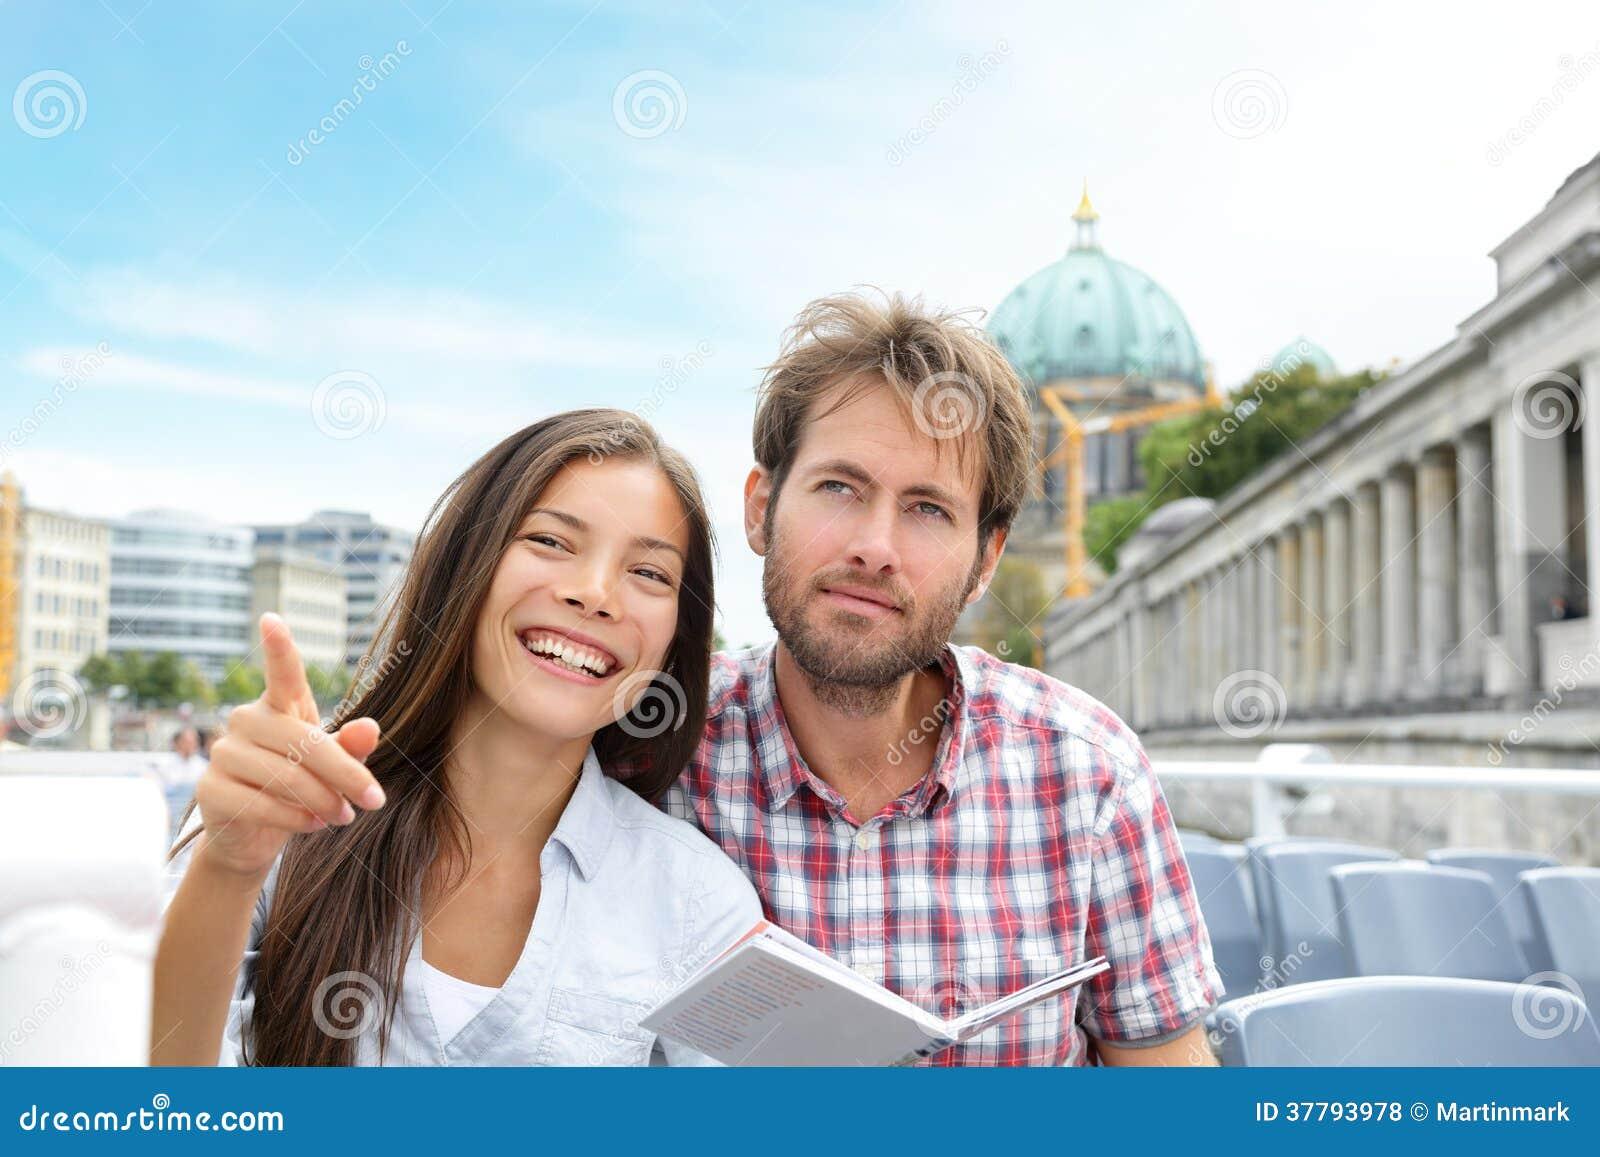 Asian dating berlin